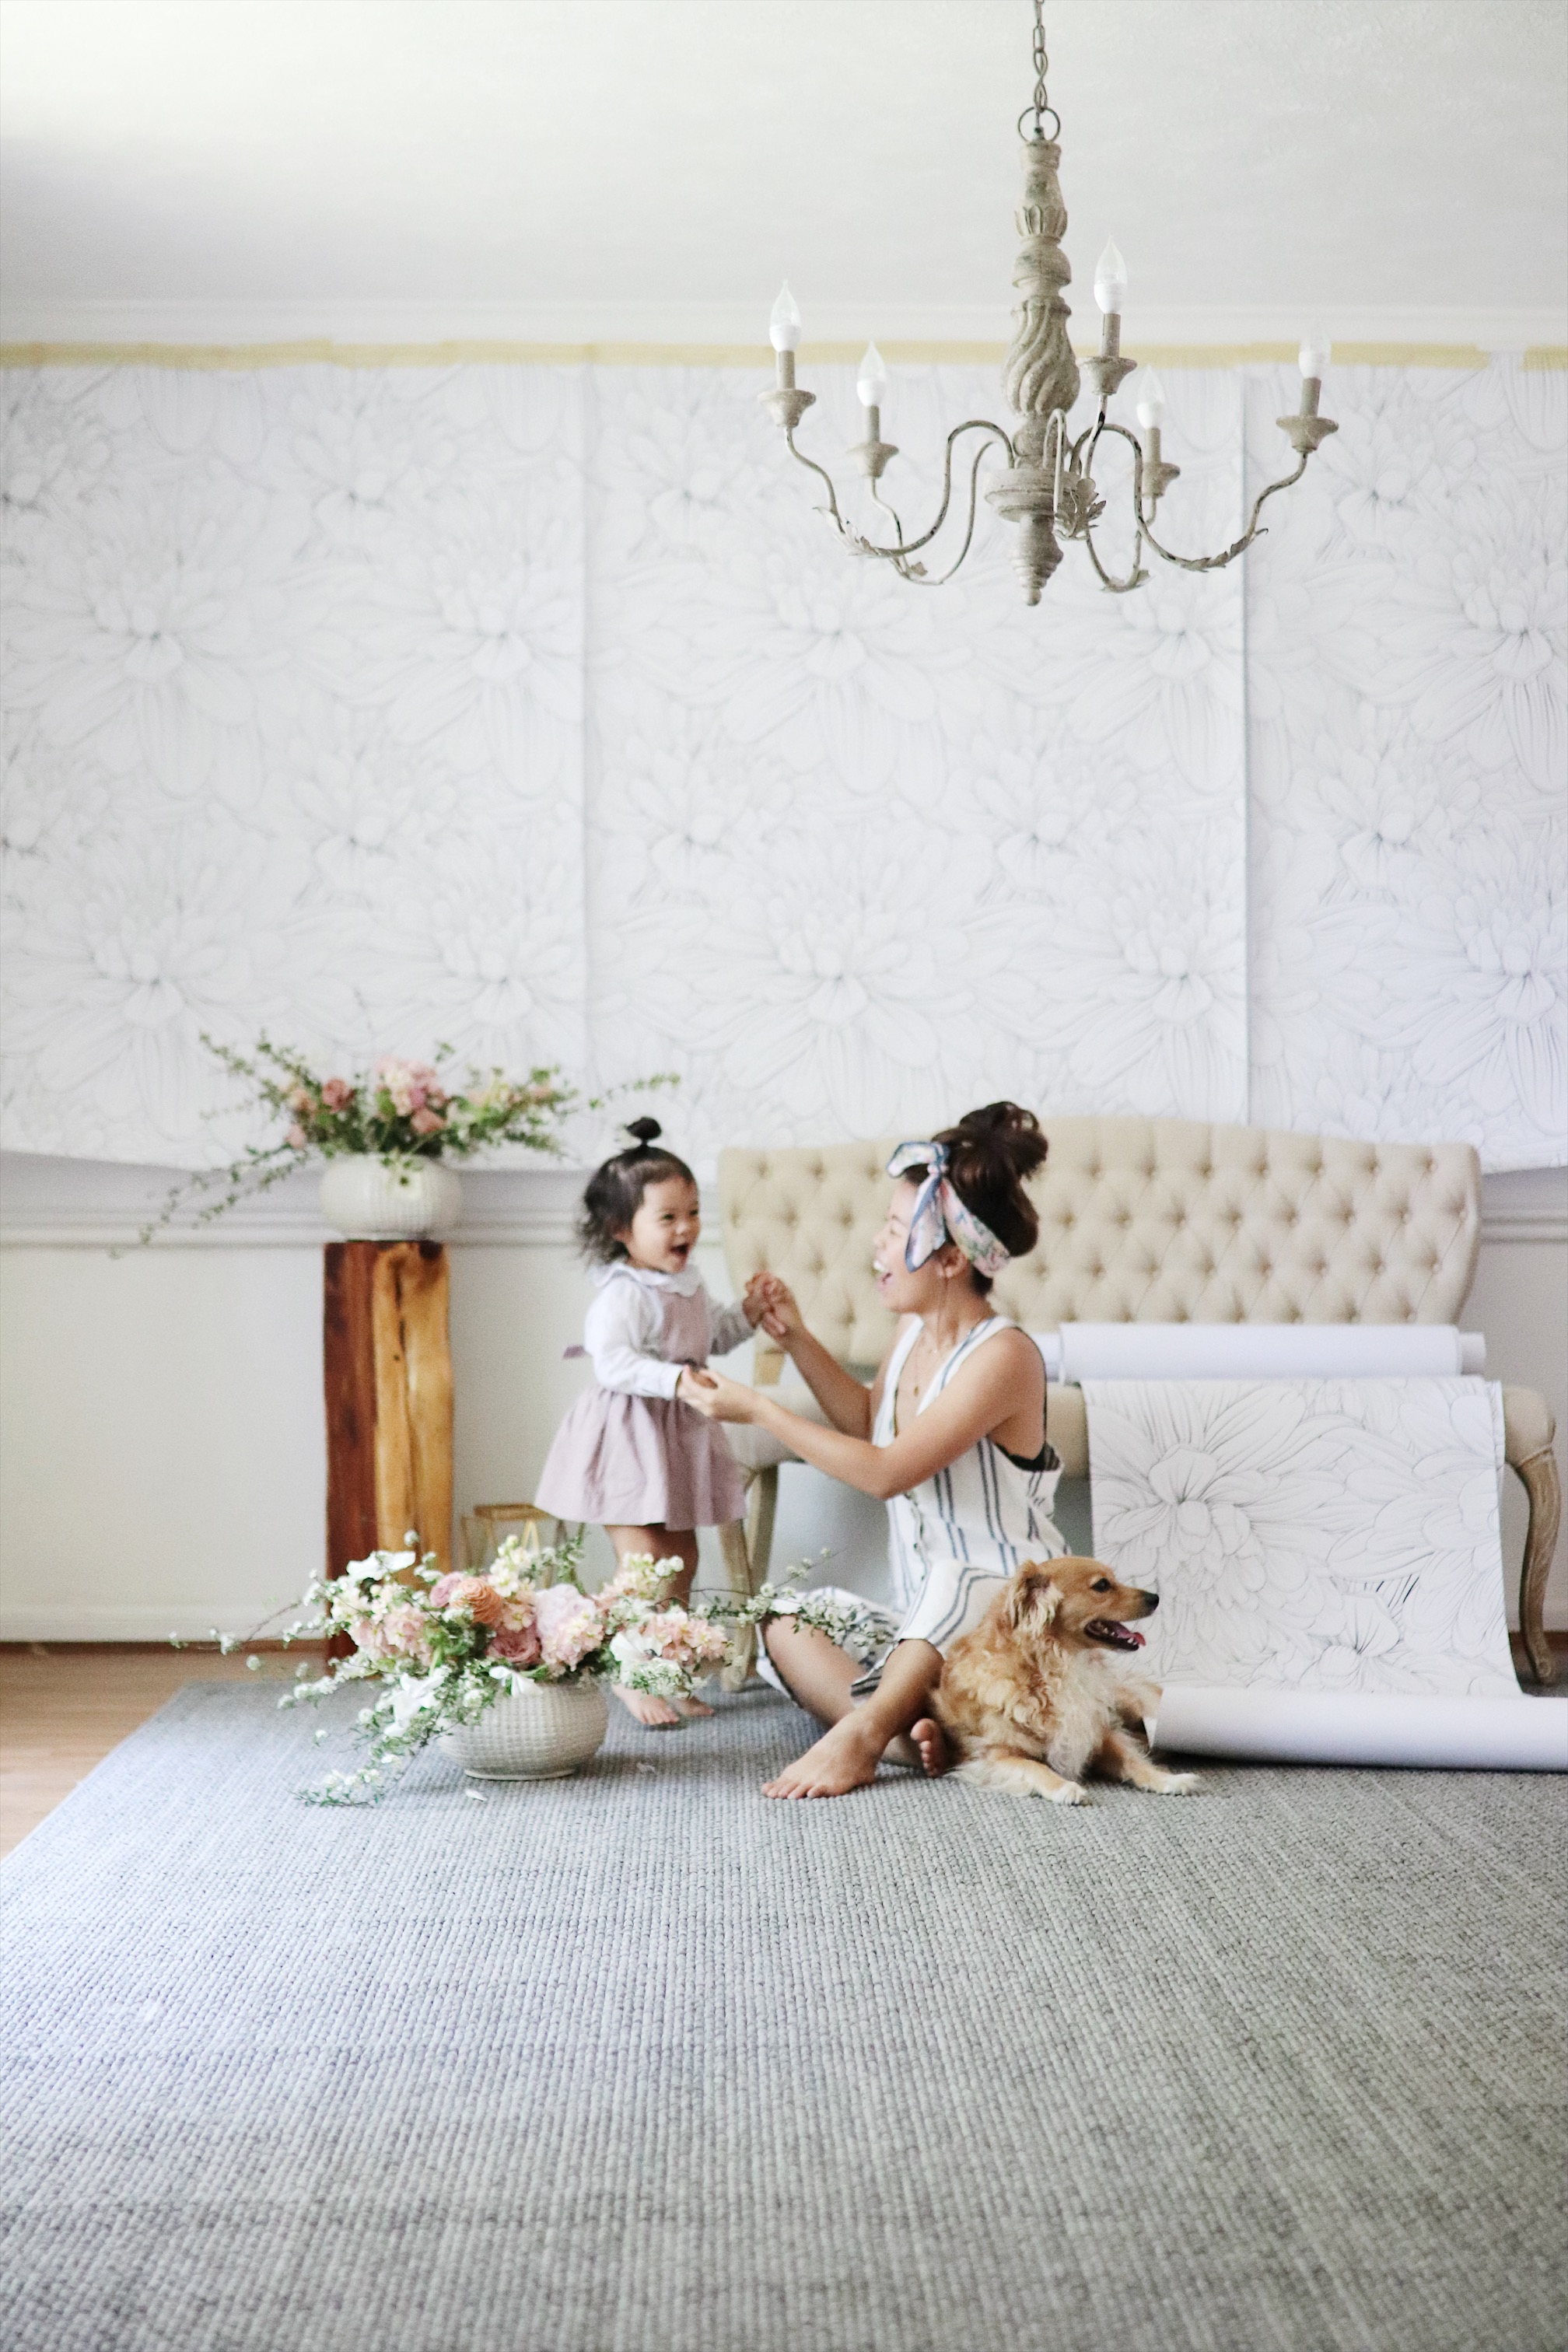 Removable Wallpaper installation Dining Room Make over modern farm house ballon garland